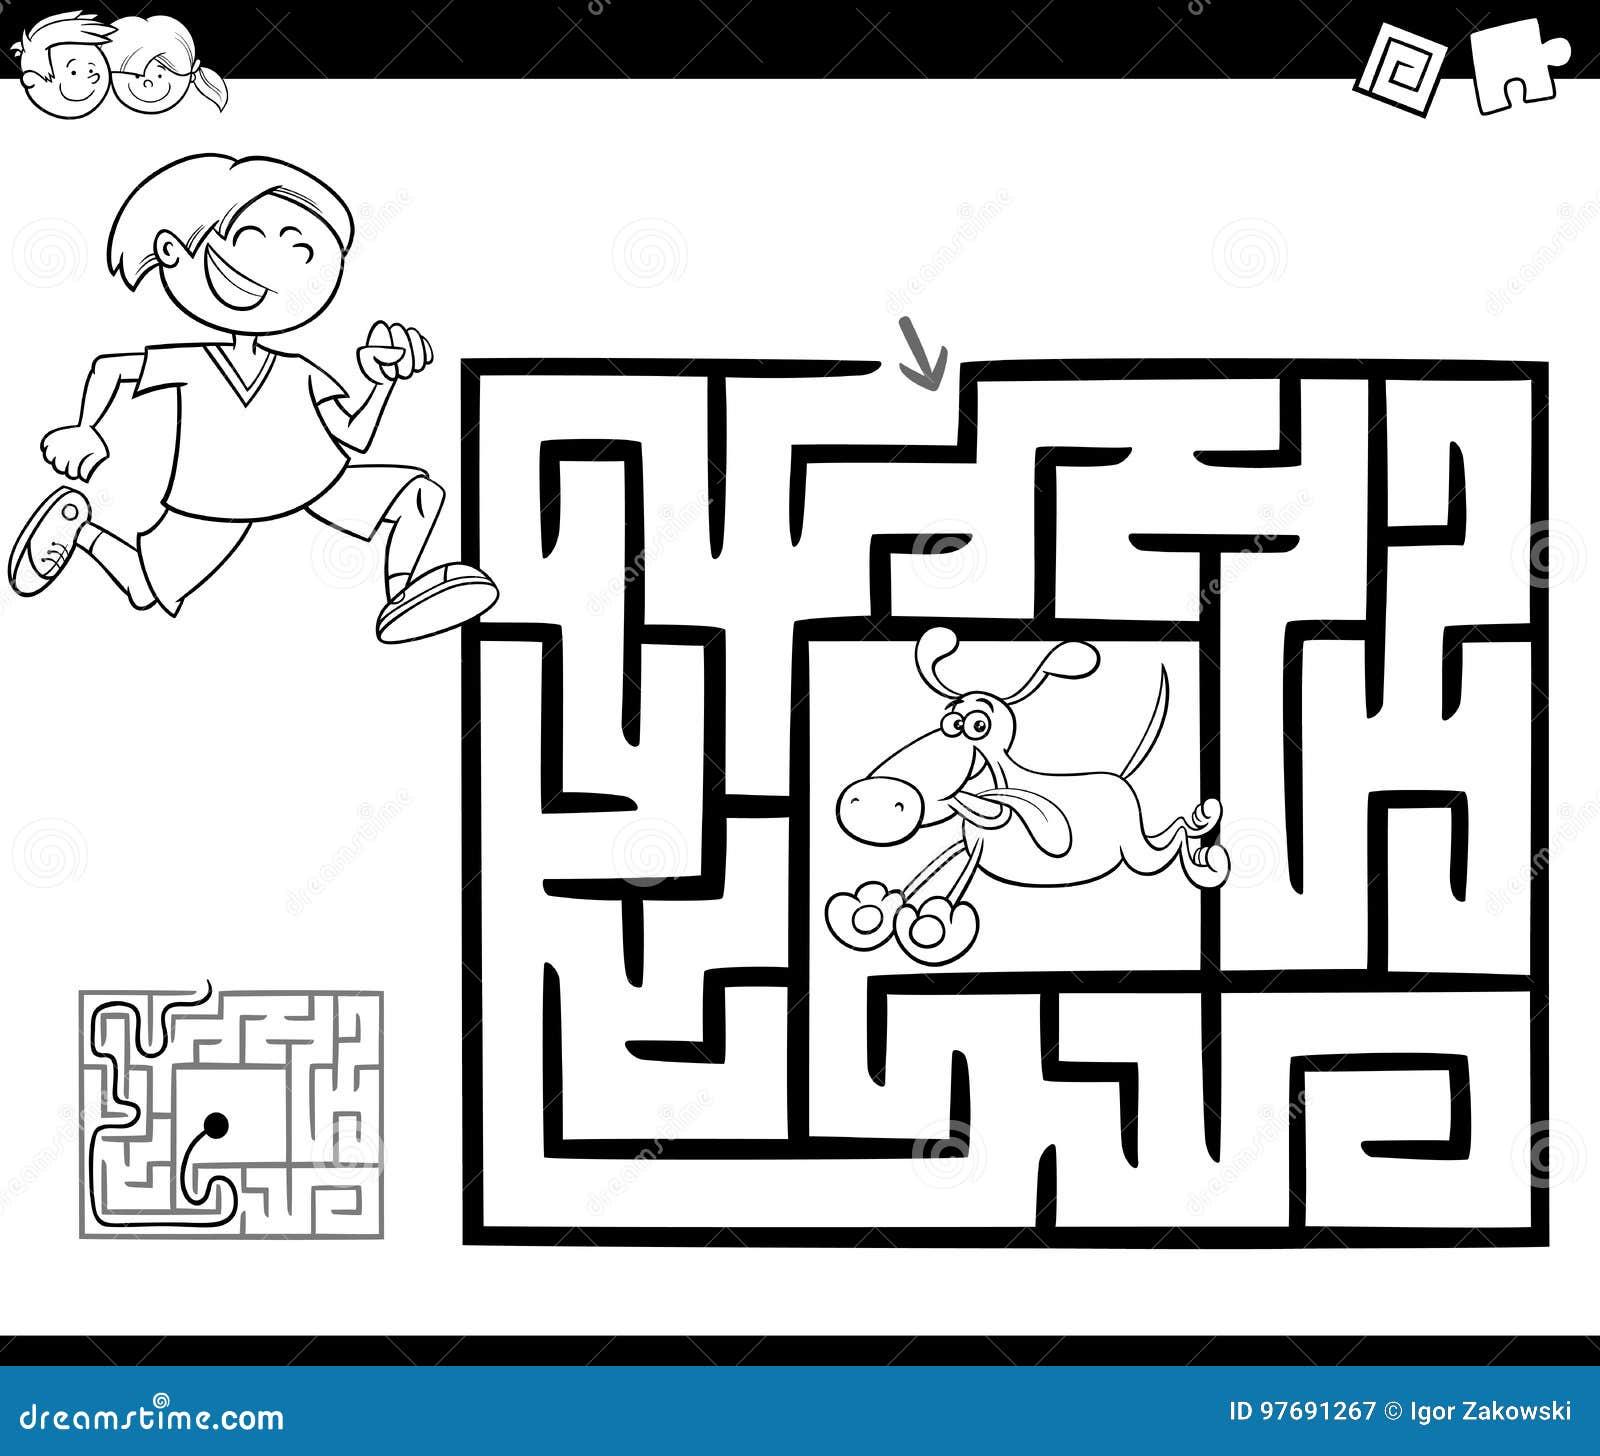 Amazing Maze Printable Worksheet Kids Activities Worksheets Mazes ...